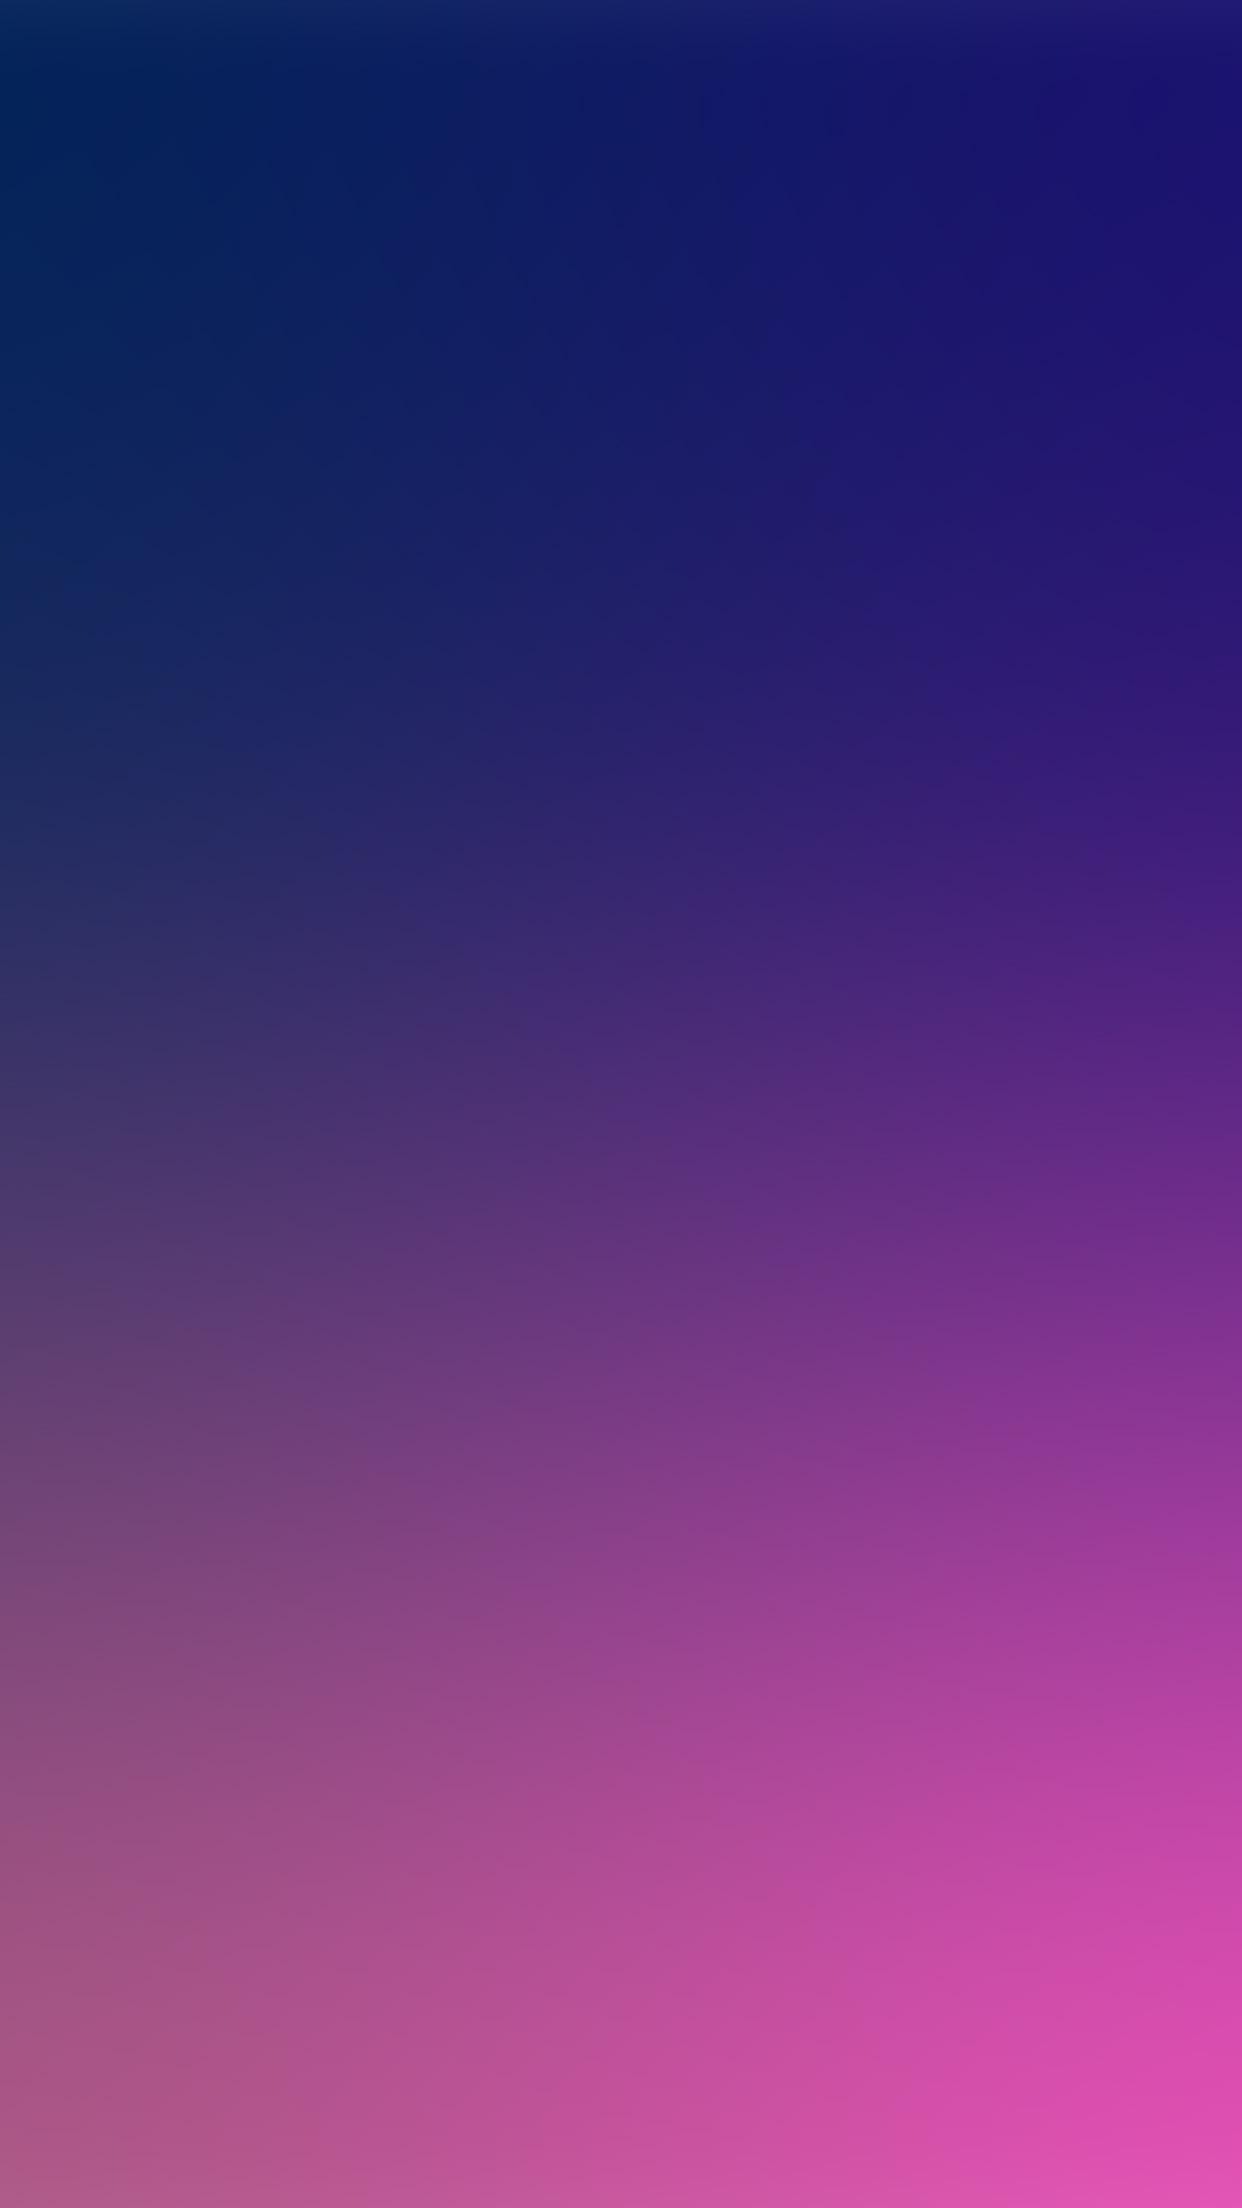 iphone7papers | iphone7 wallpaper | sm27-blue-purple-color-blur